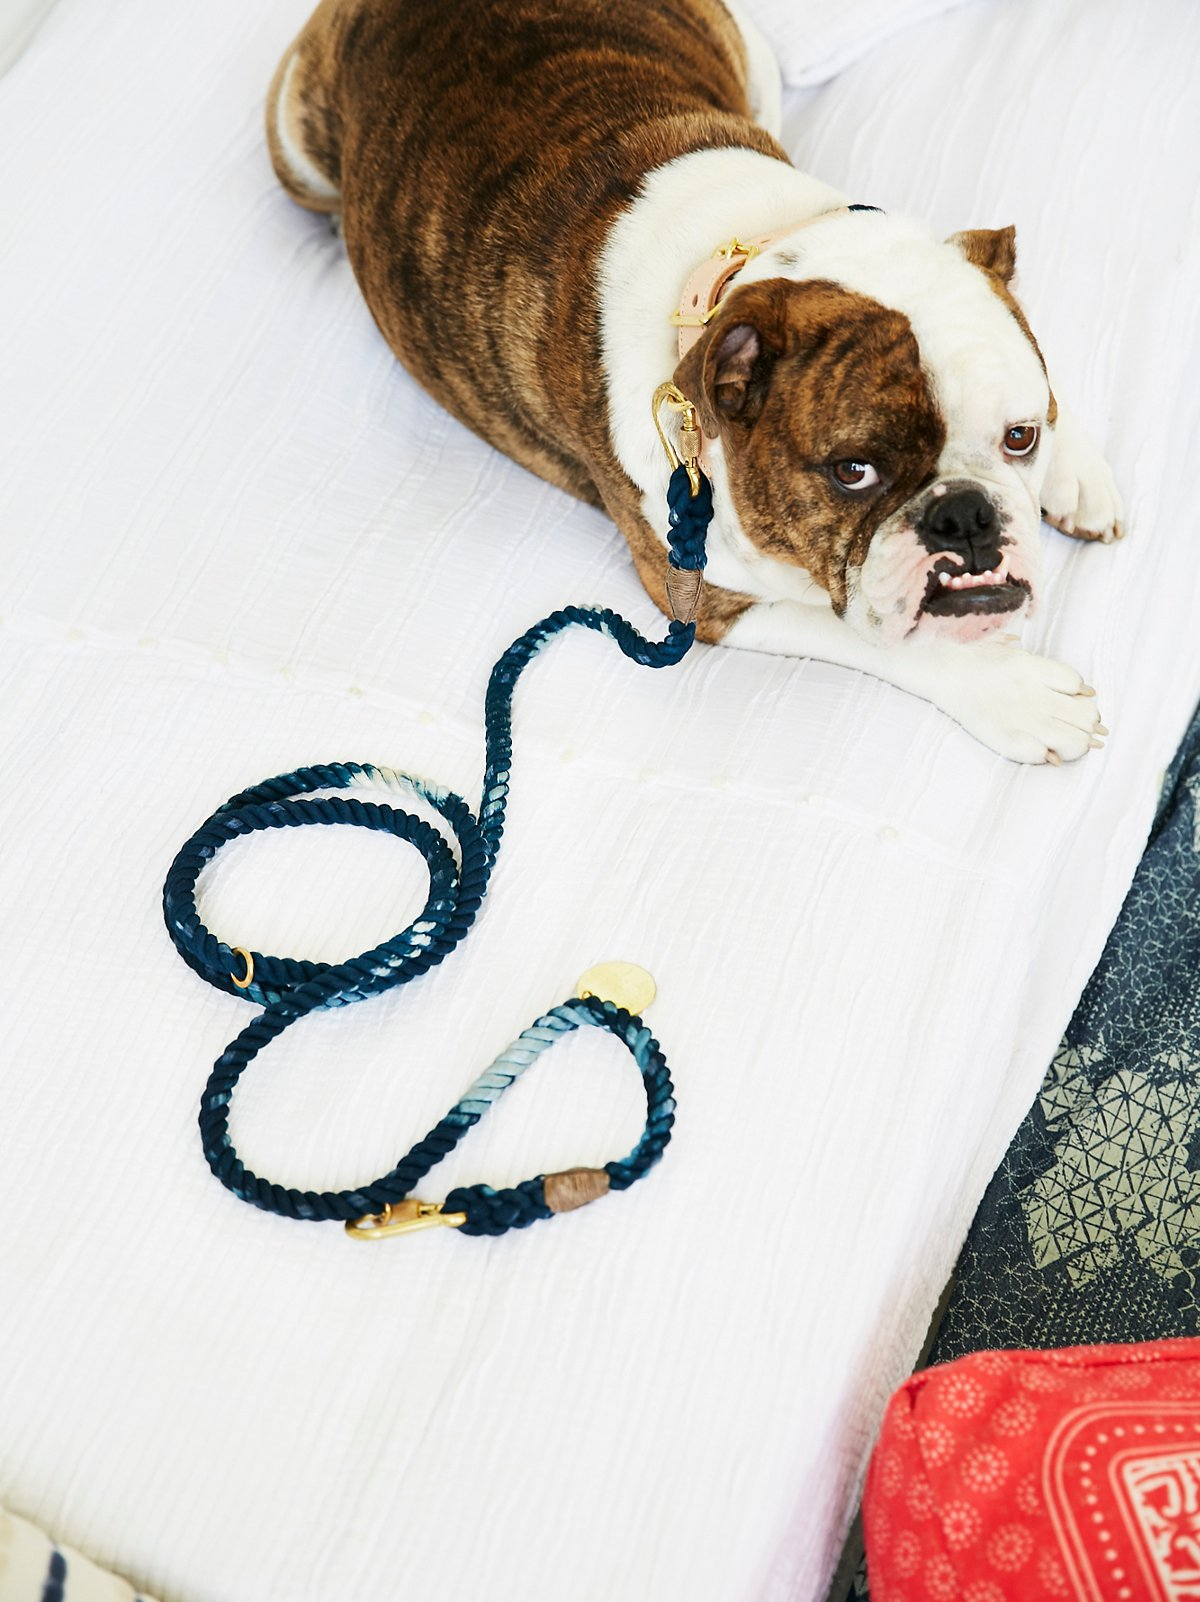 Marble牵狗链绳